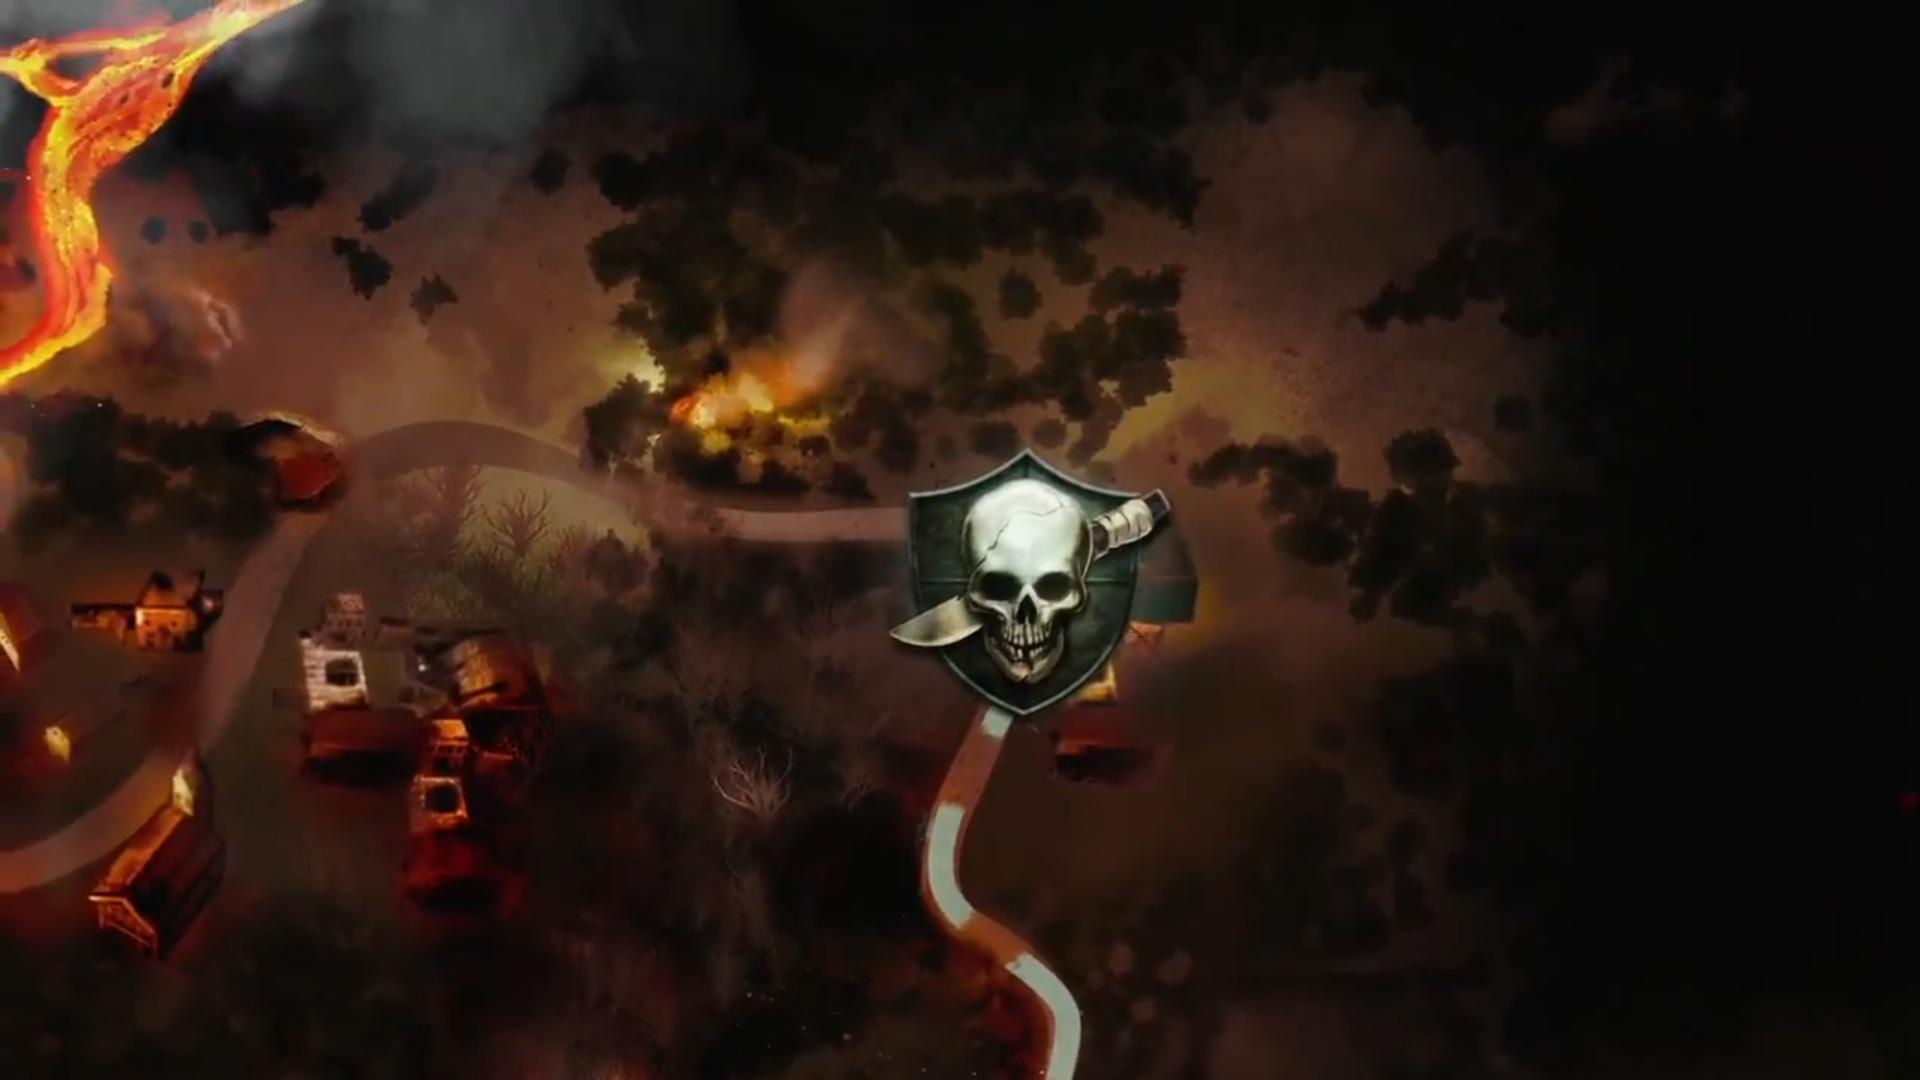 COD BO2 Zombies Wallpaper